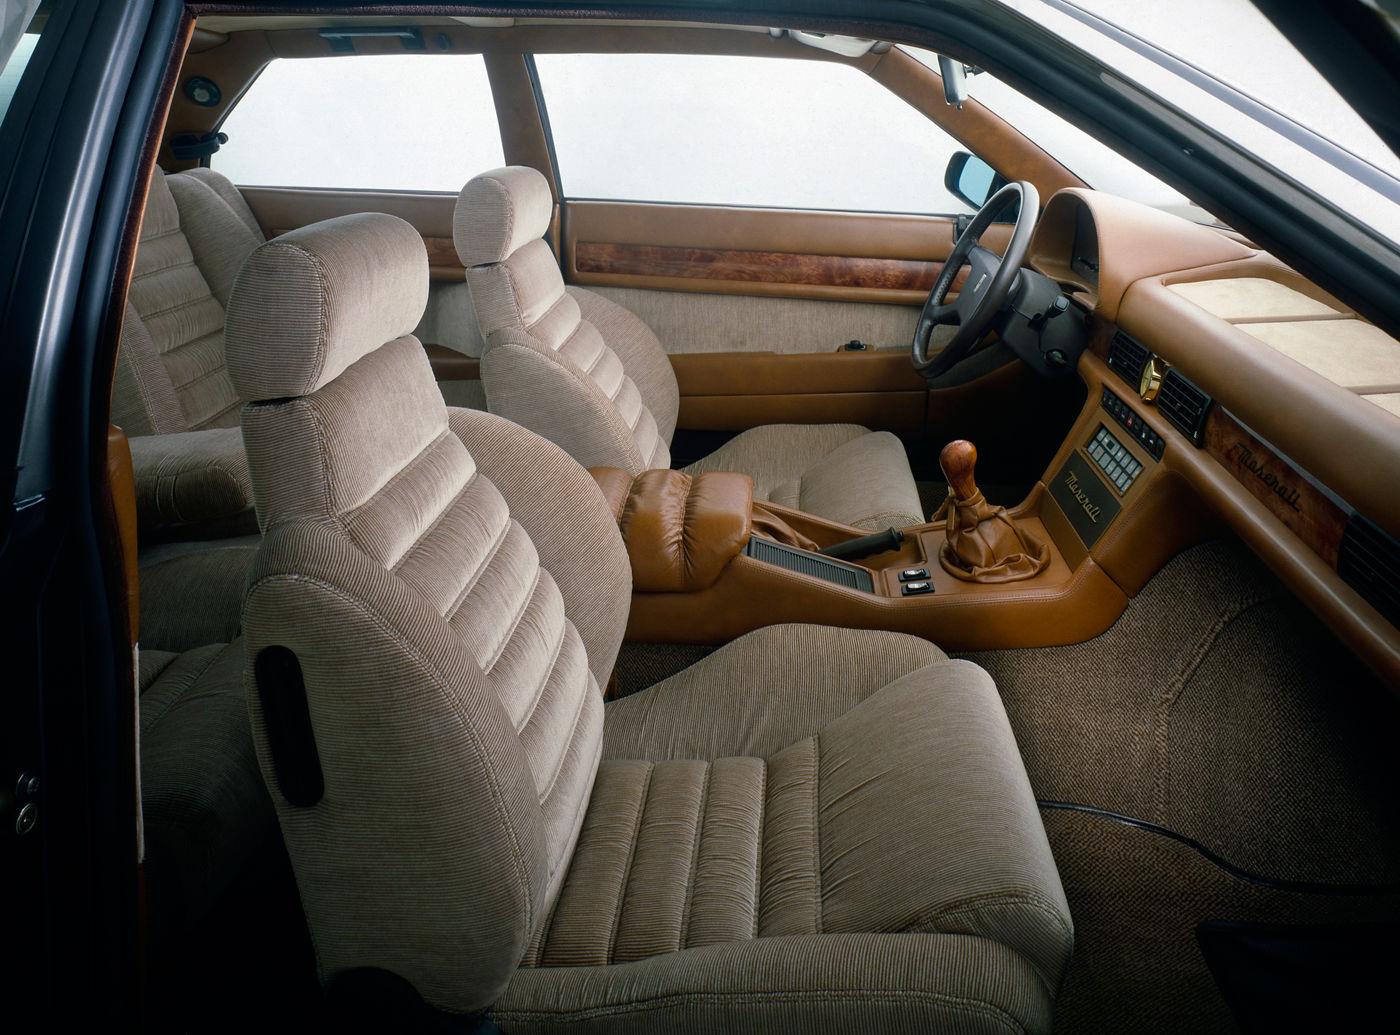 1989 Maserati 222 - Biturbo - the classic 2-door interior view